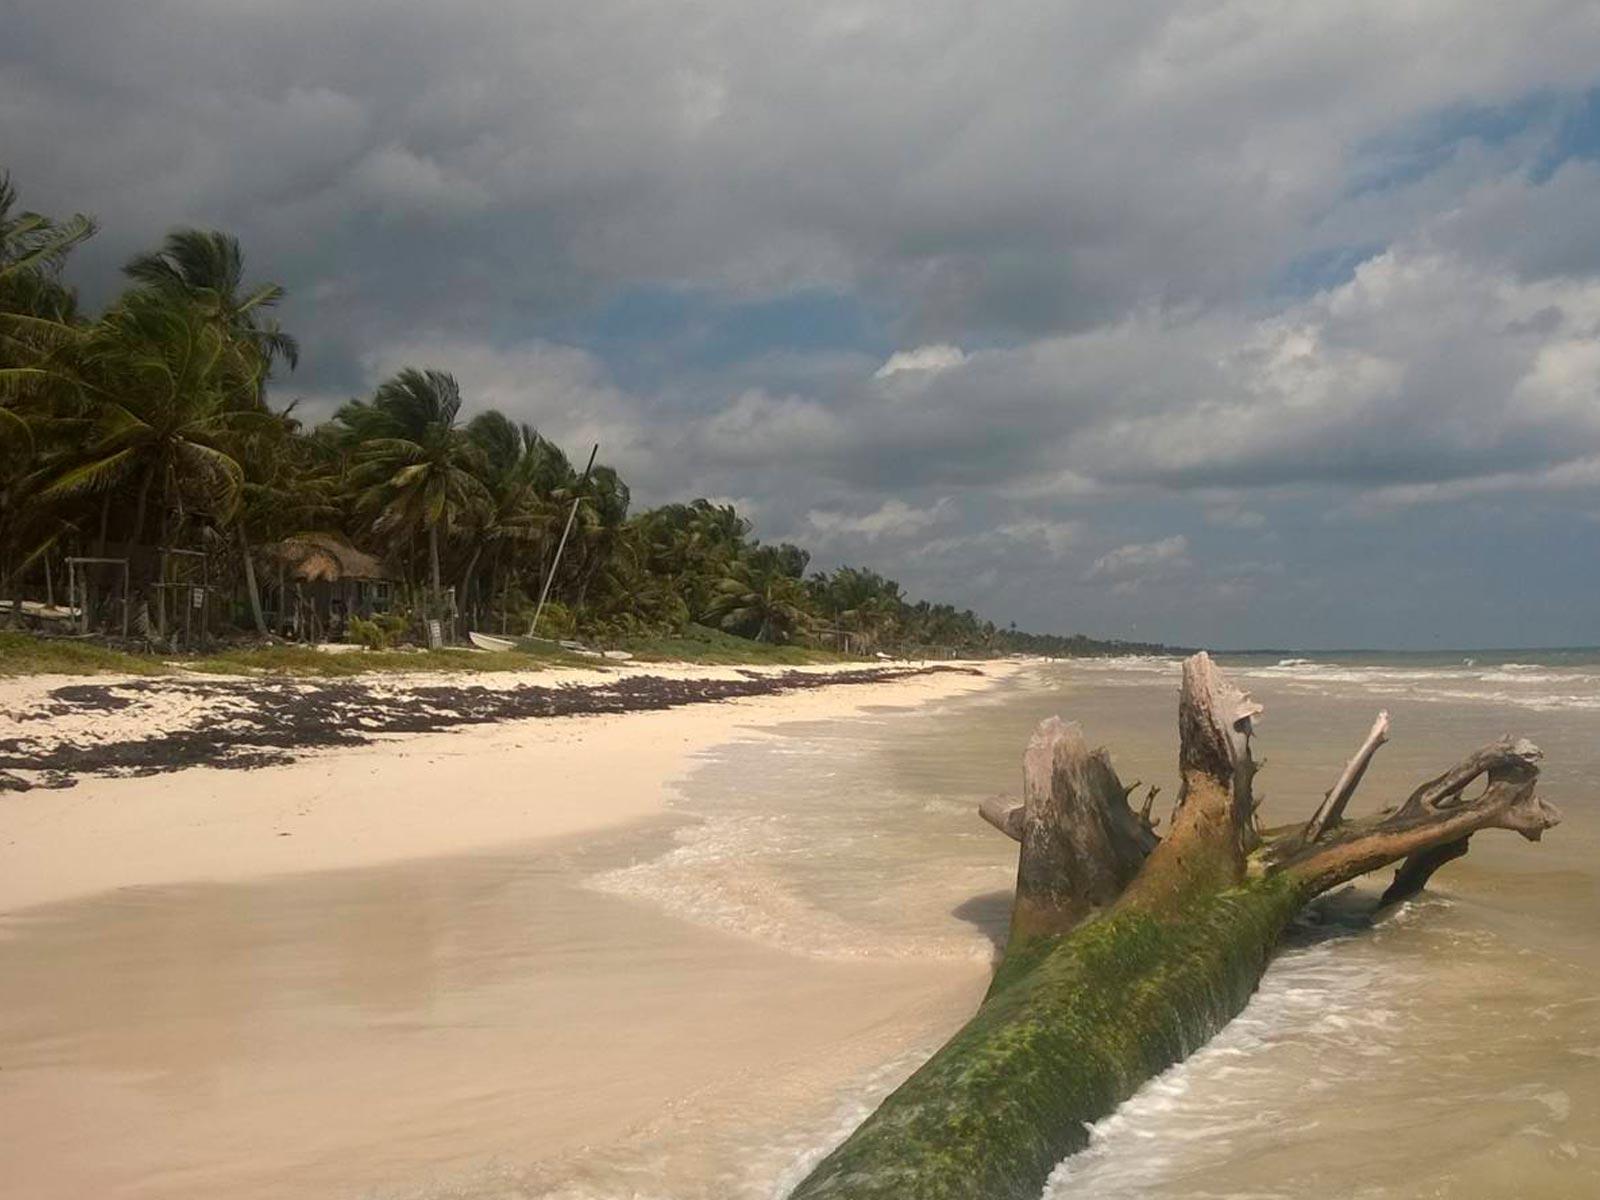 Messico-mexico-tullum-riviera-maya